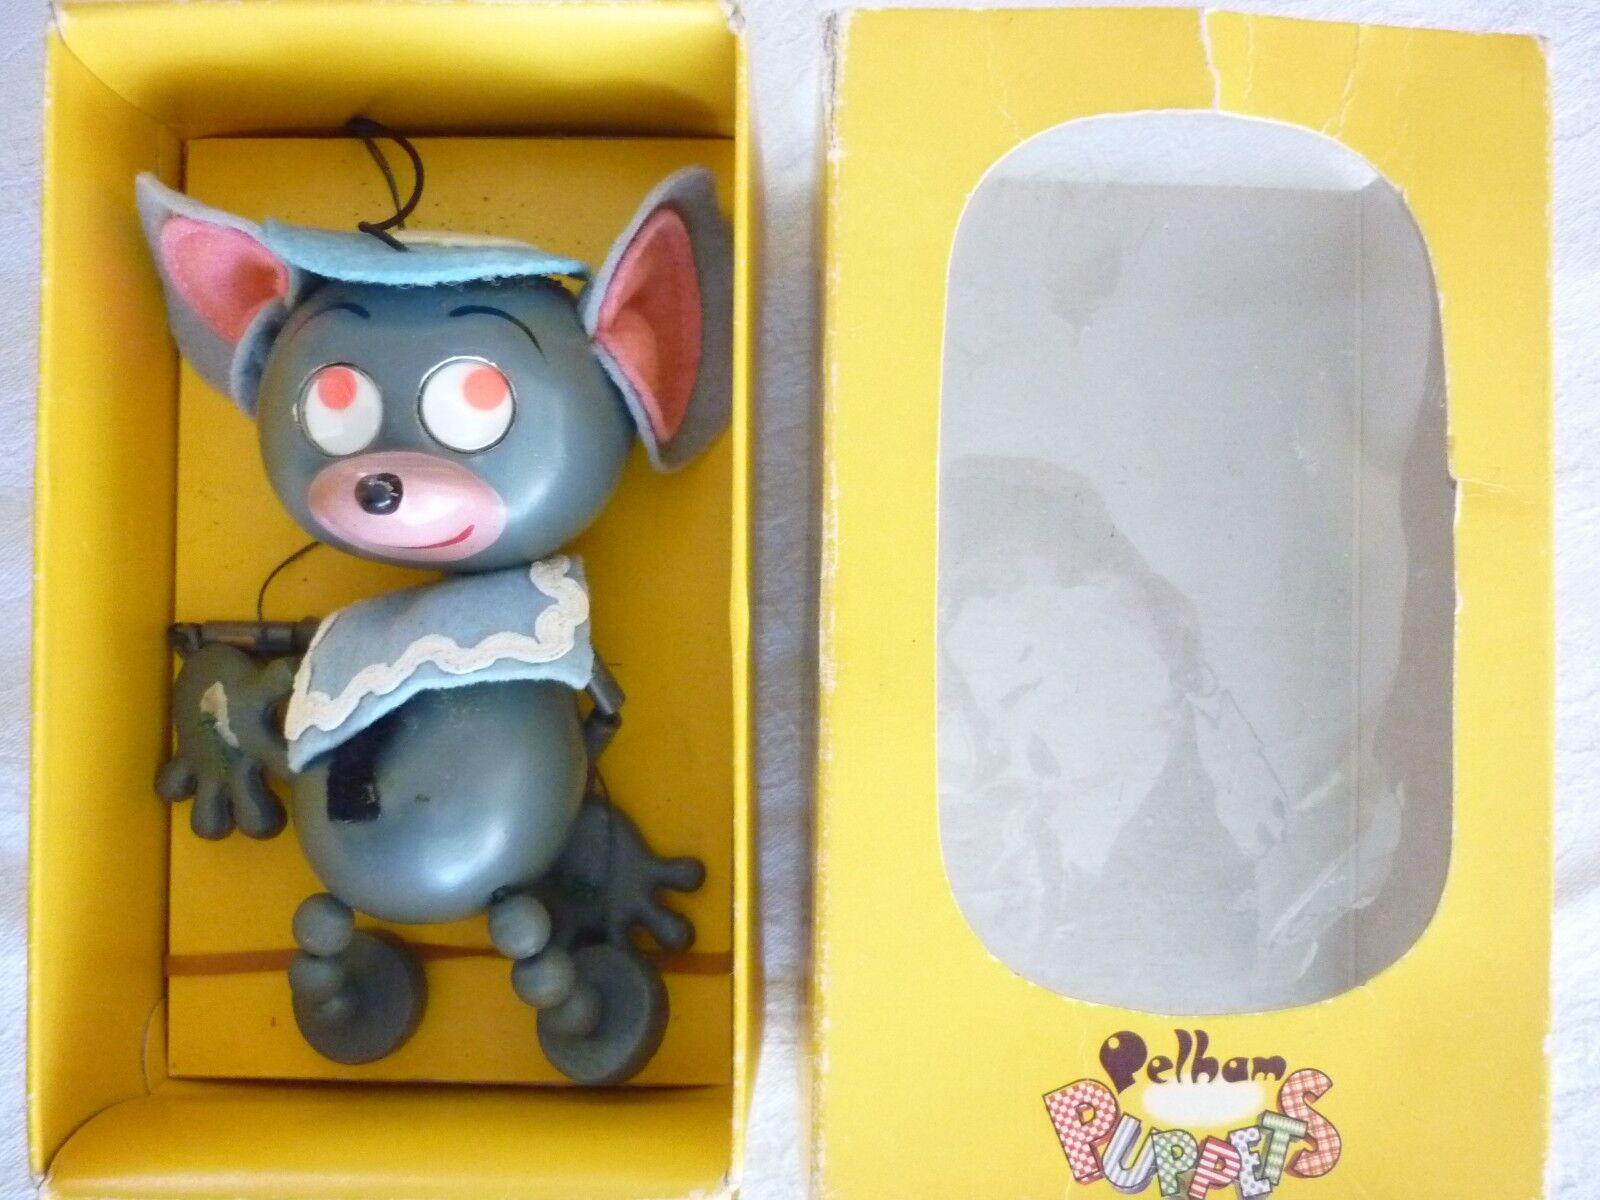 Pelham puppet  boxed  Mouse wobbly googly eyed vintage